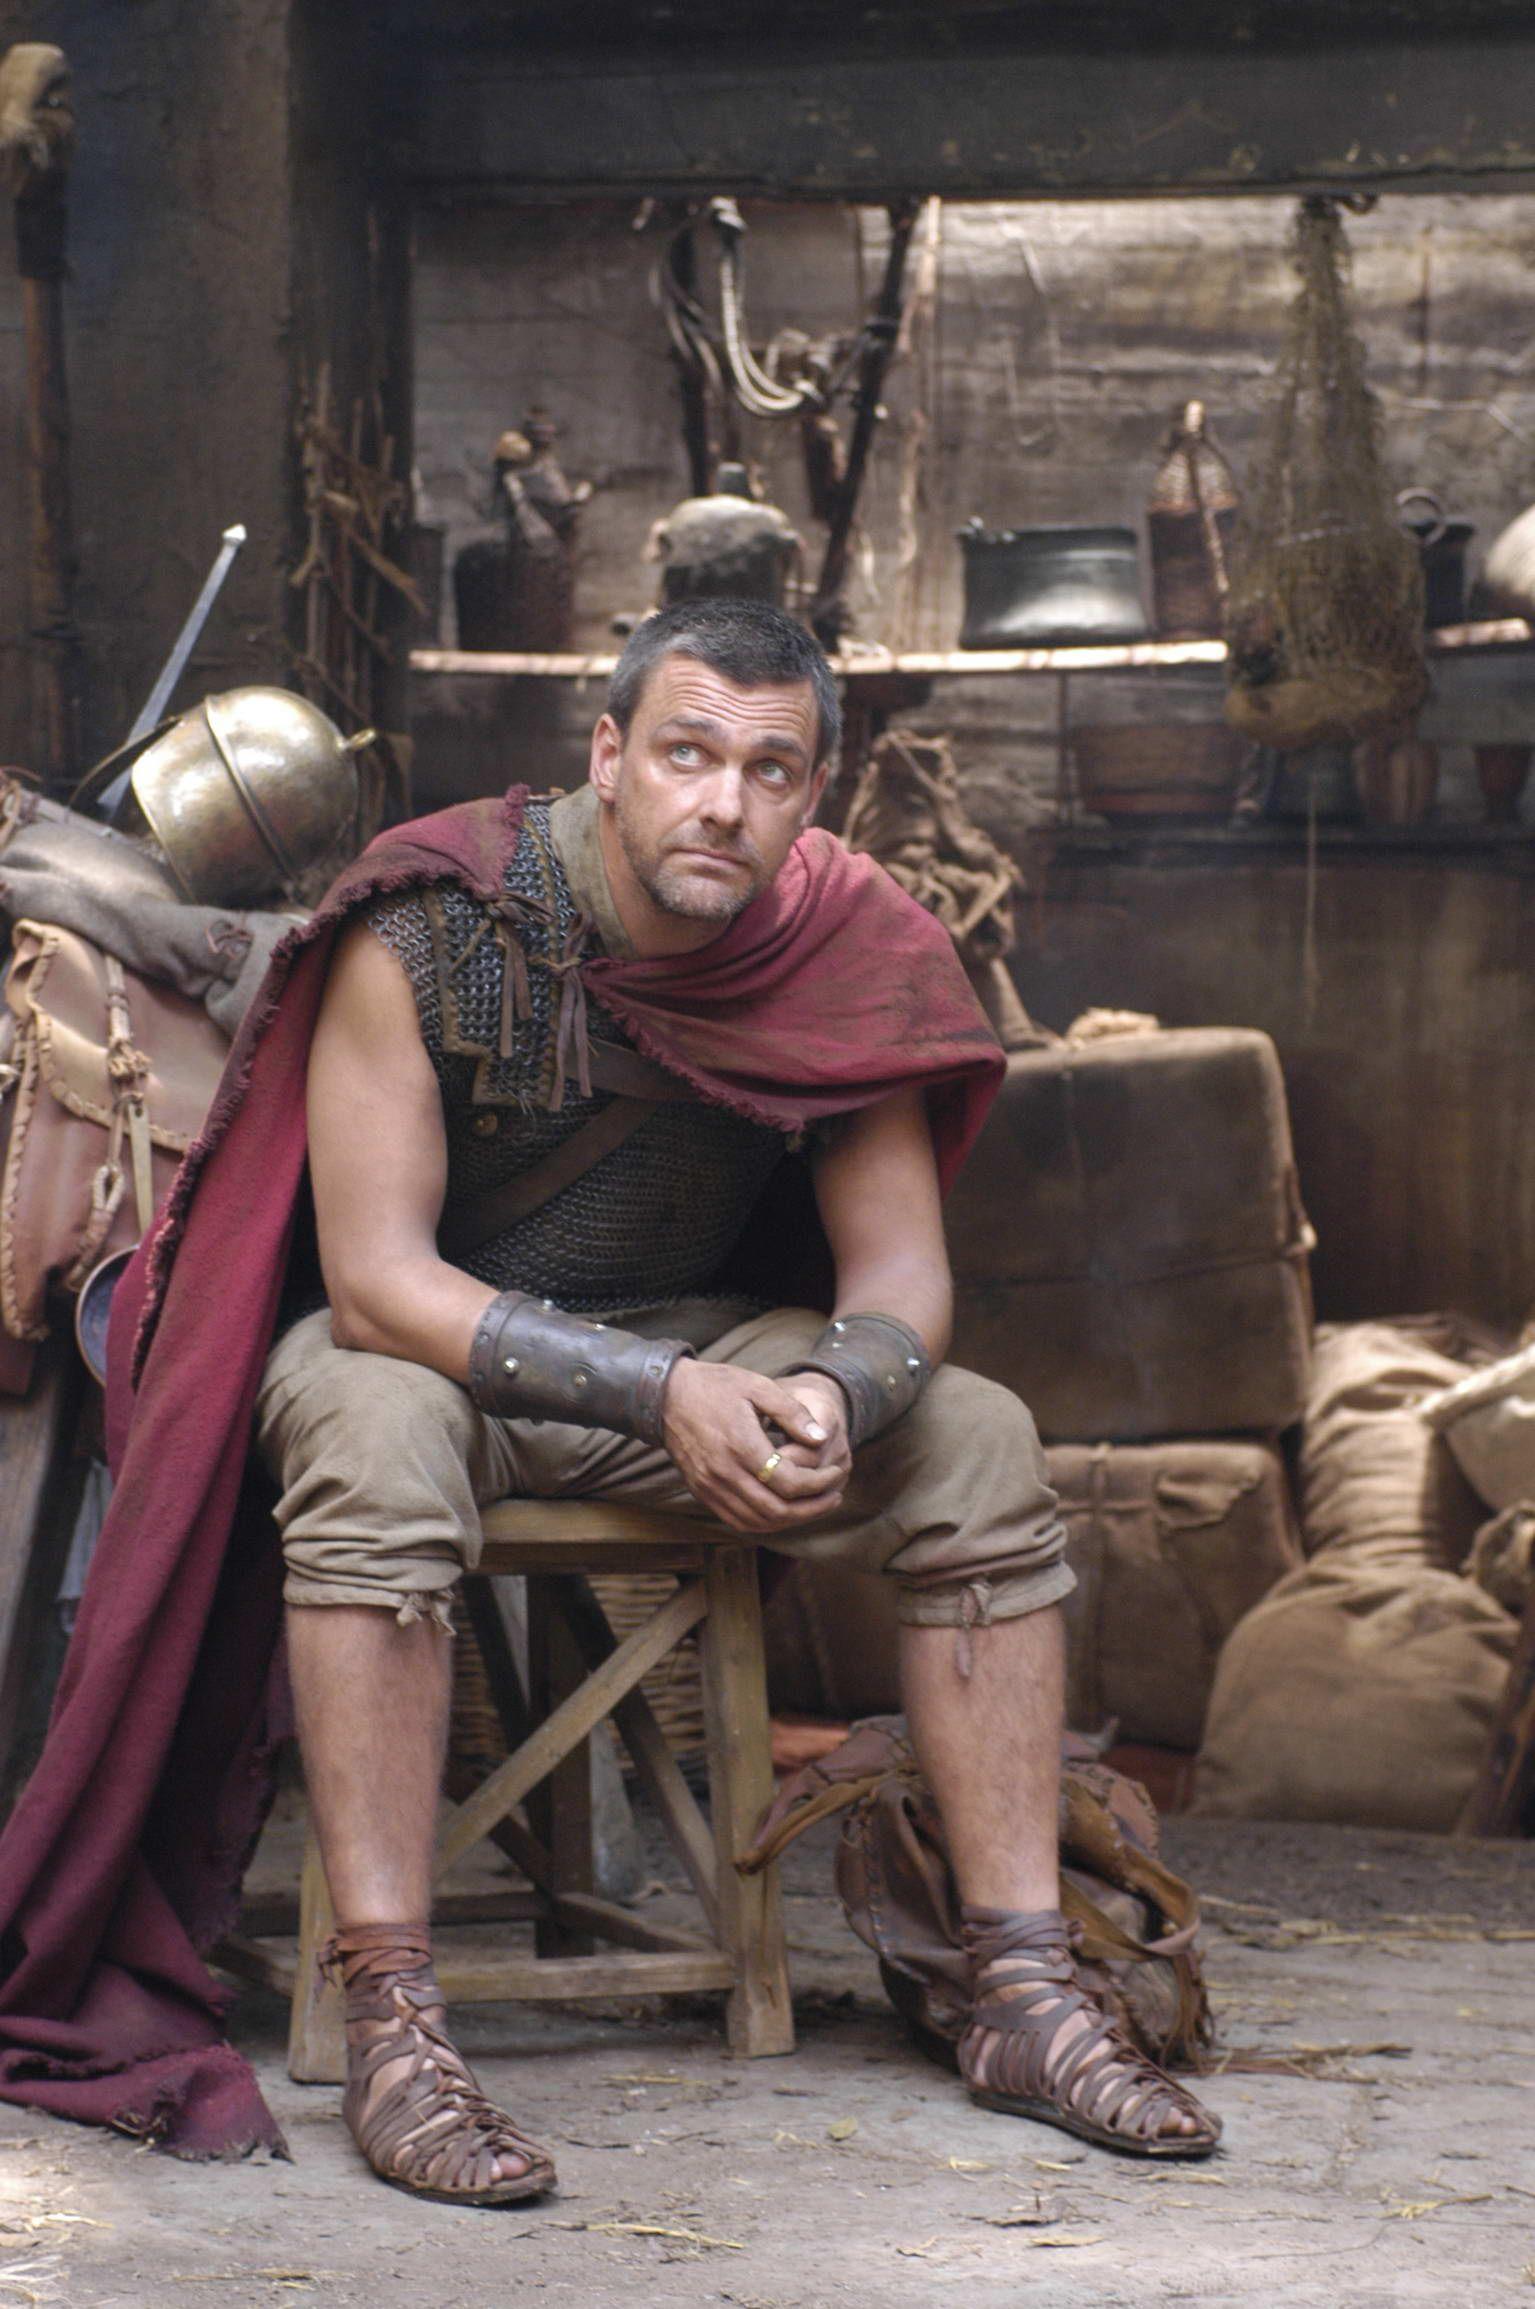 Rome TV Series - Season 1 Episode 9 Still | ROME | Rome tv ...